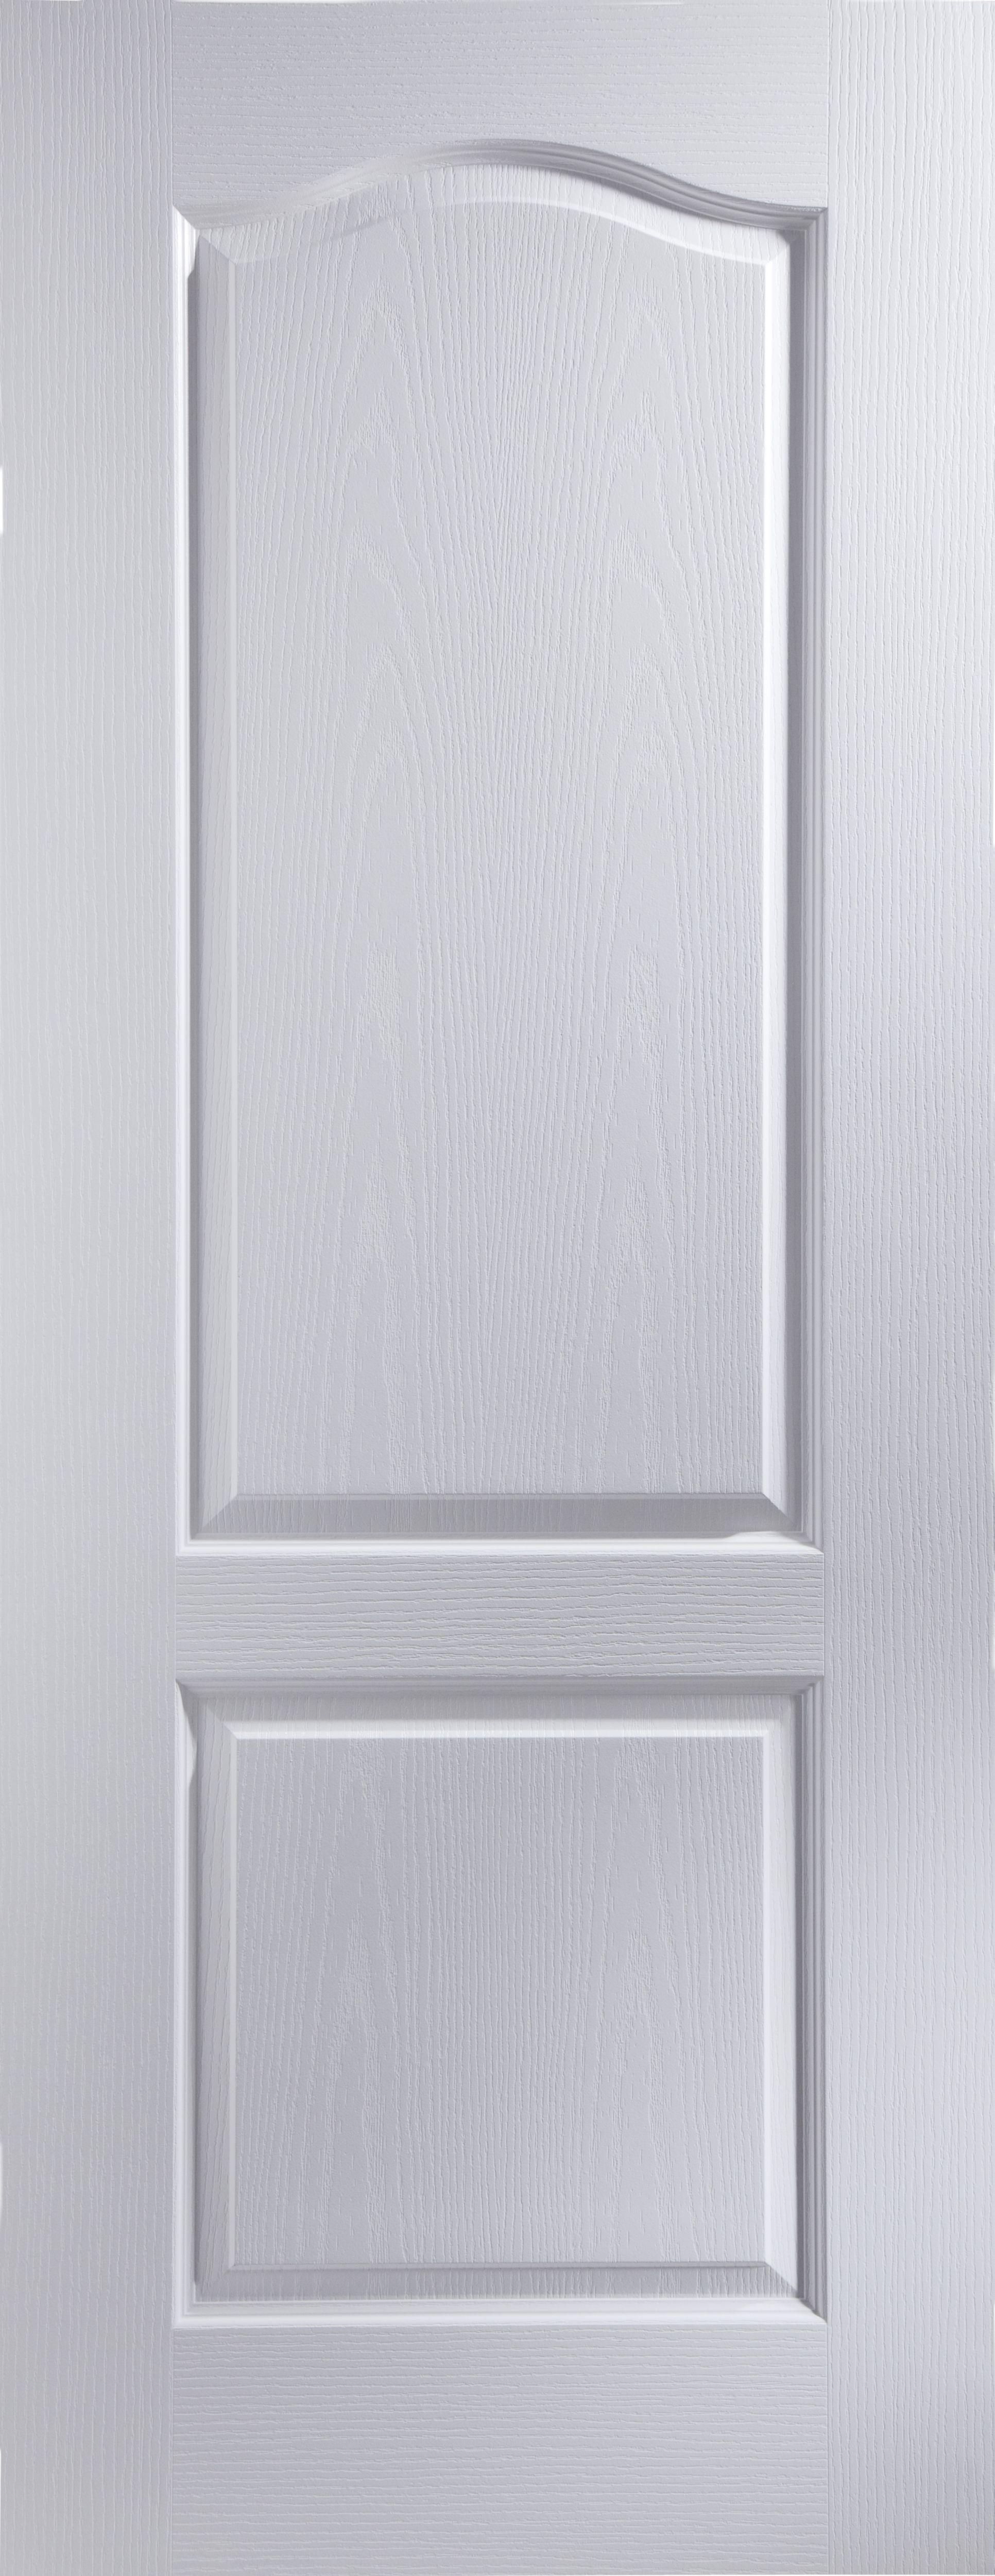 2 Panel Arched Primed Woodgrain Unglazed Internal Standard Door H